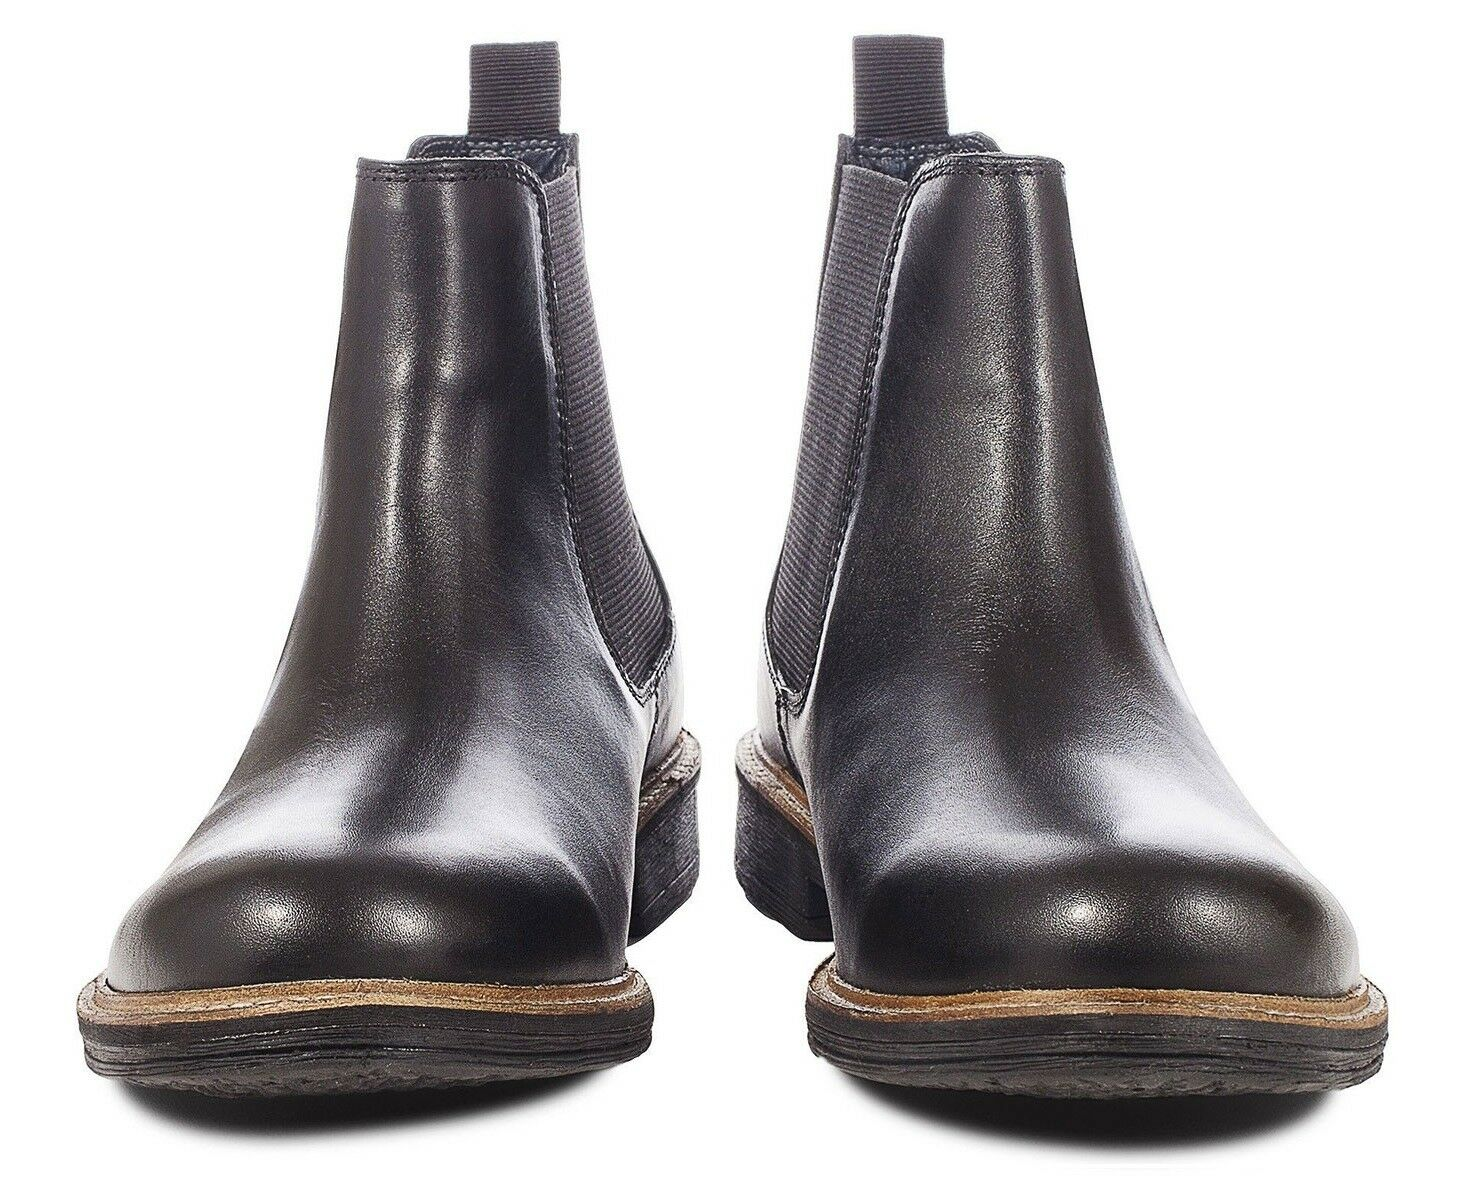 Herren ROTfoot Baxendale Chelsea Stiefel Glatt in Leder Stiefel Slip Gr.42 in Glatt Schwarz f59012